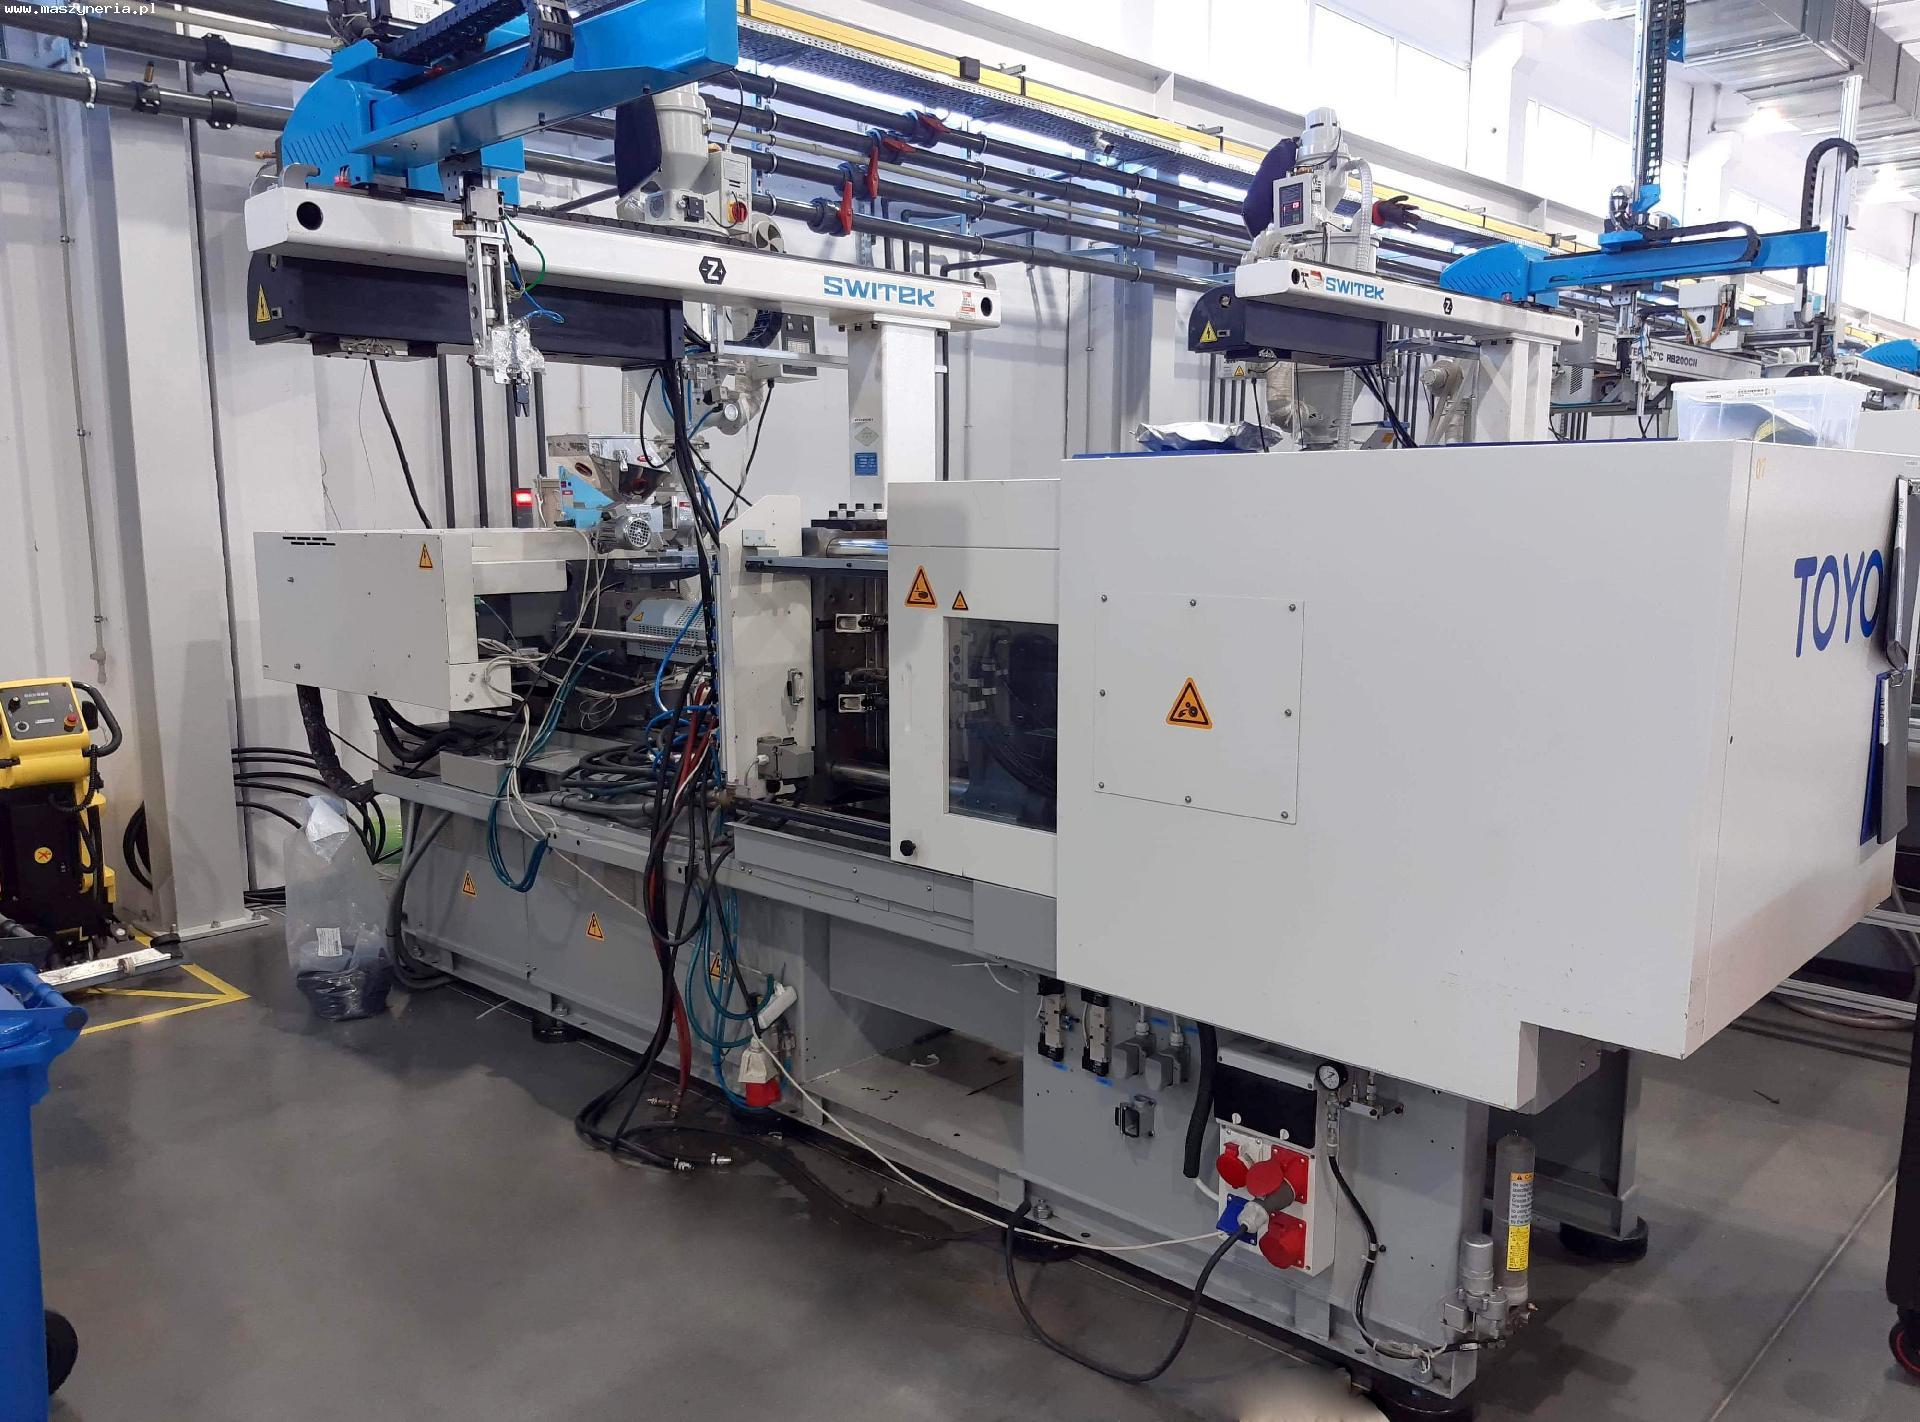 TOYO MACCHINE SI-130-6 iniezione plastica macchina in vendita - foto 3